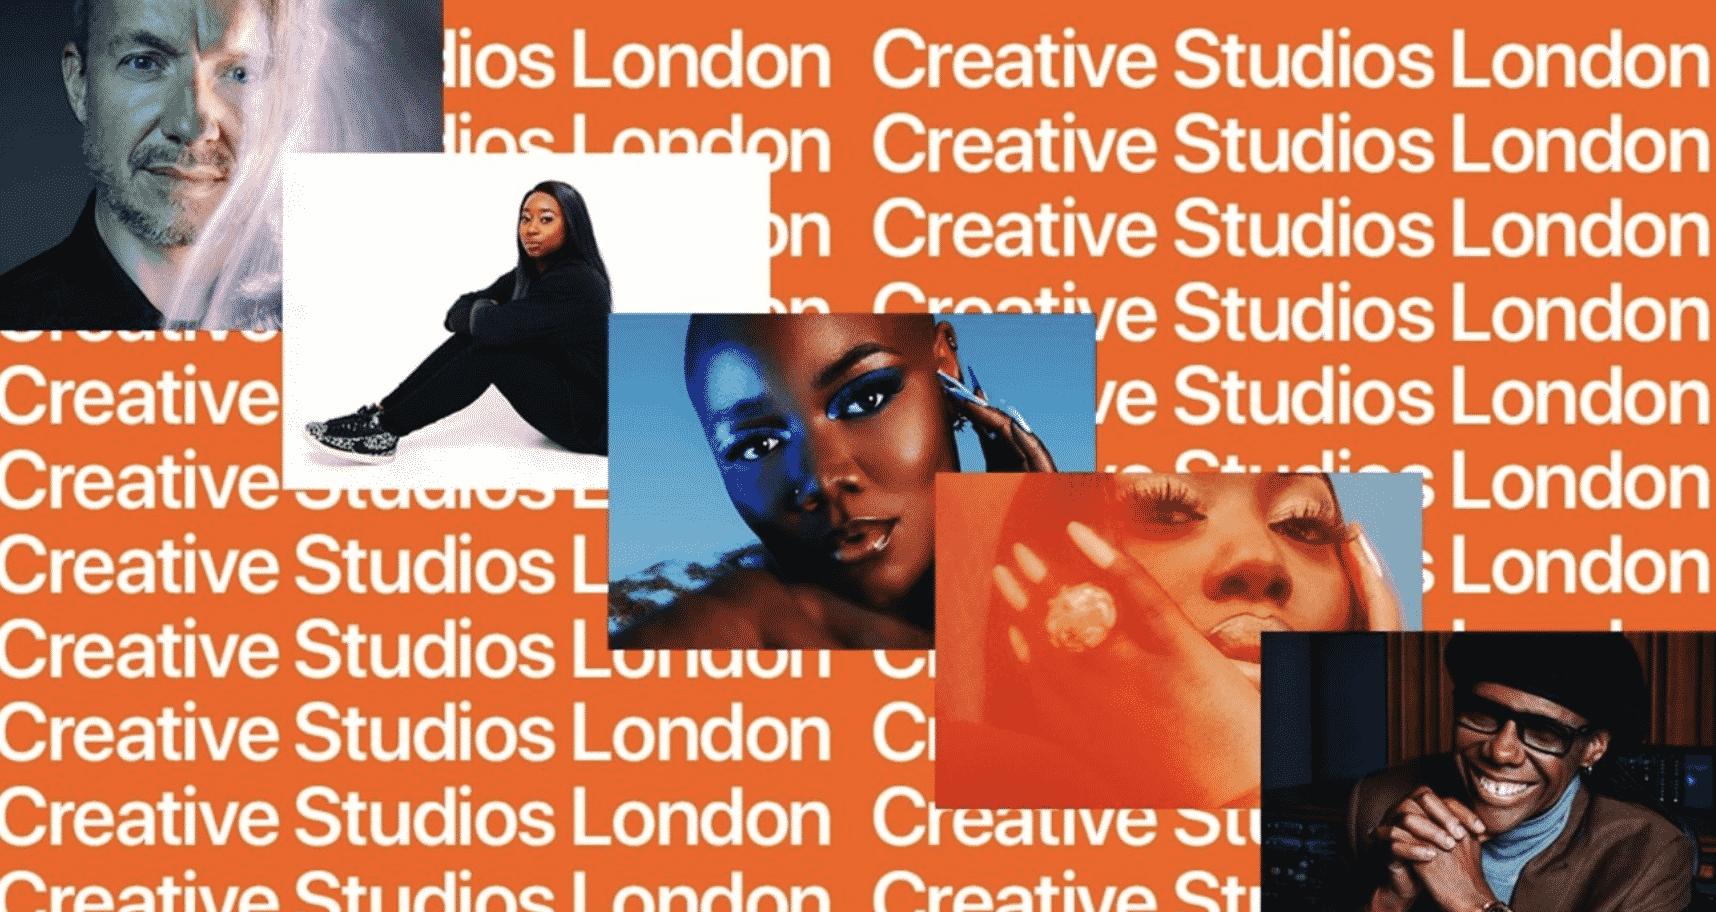 Apple Creative Studios